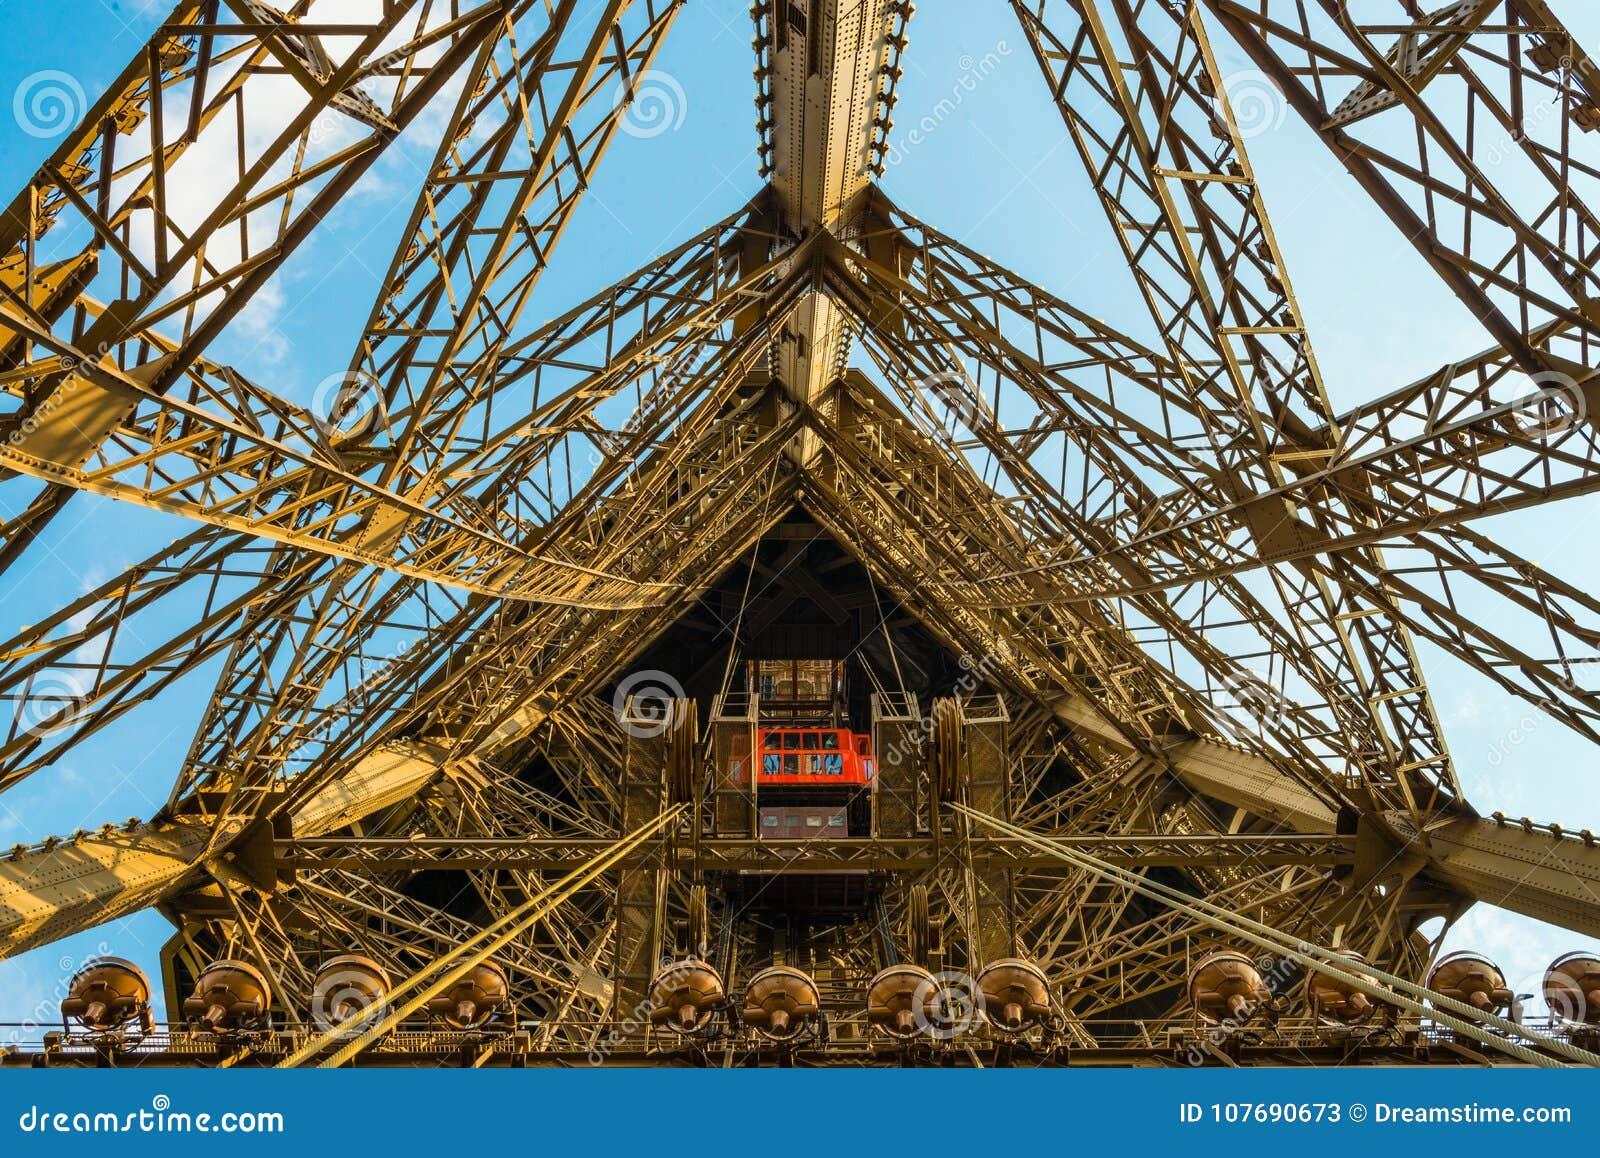 Hissaxel på Eiffeltorn i ett brett vinkelskott